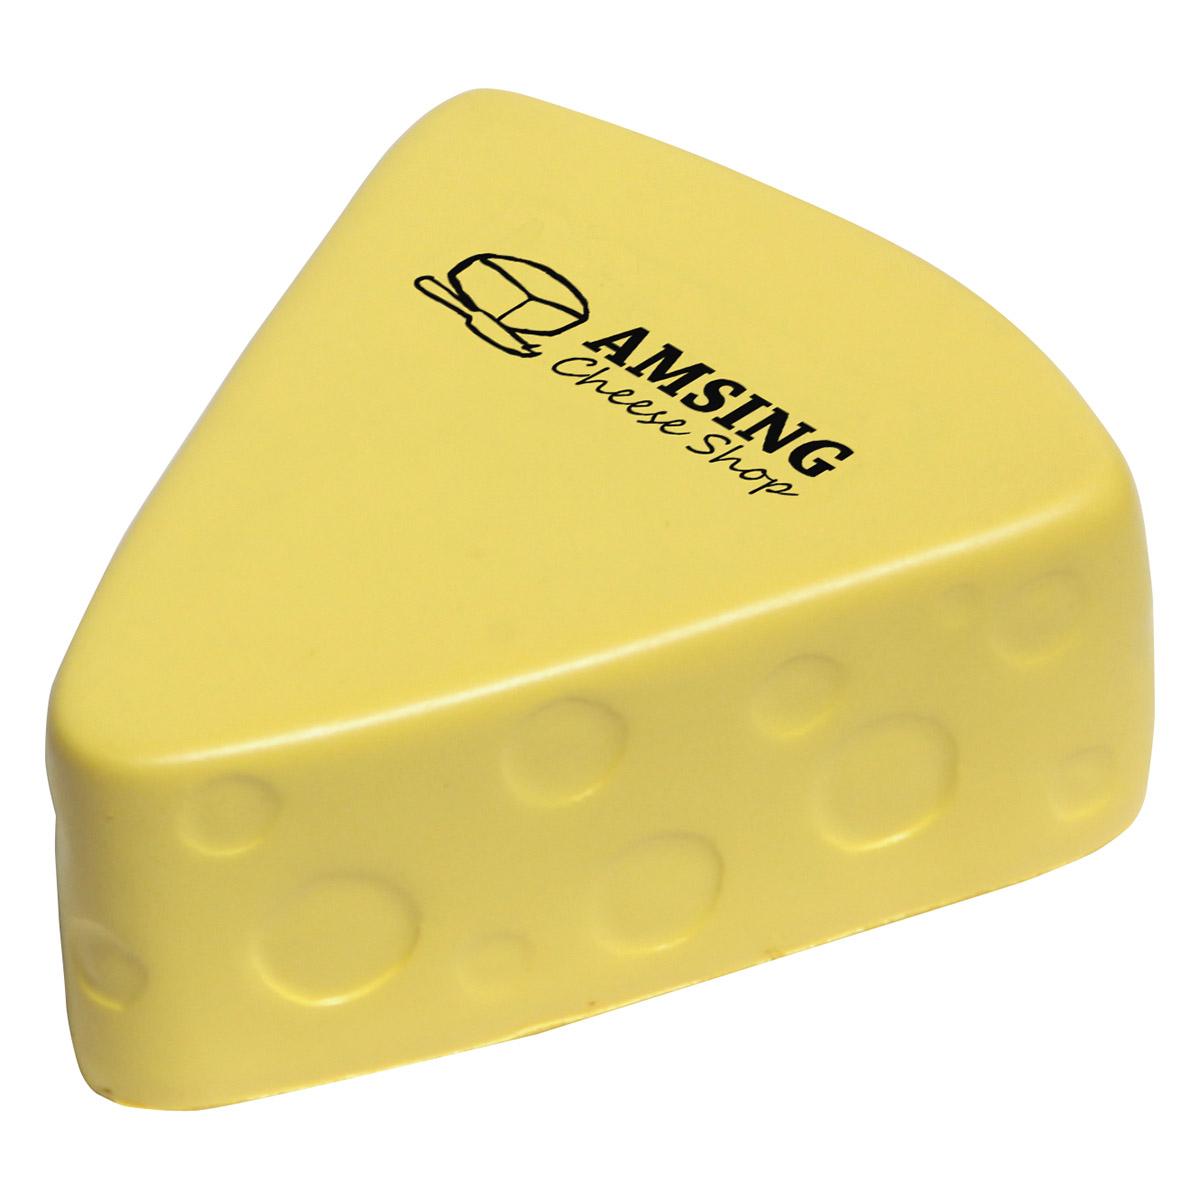 balle anti-stress en forme de fromage